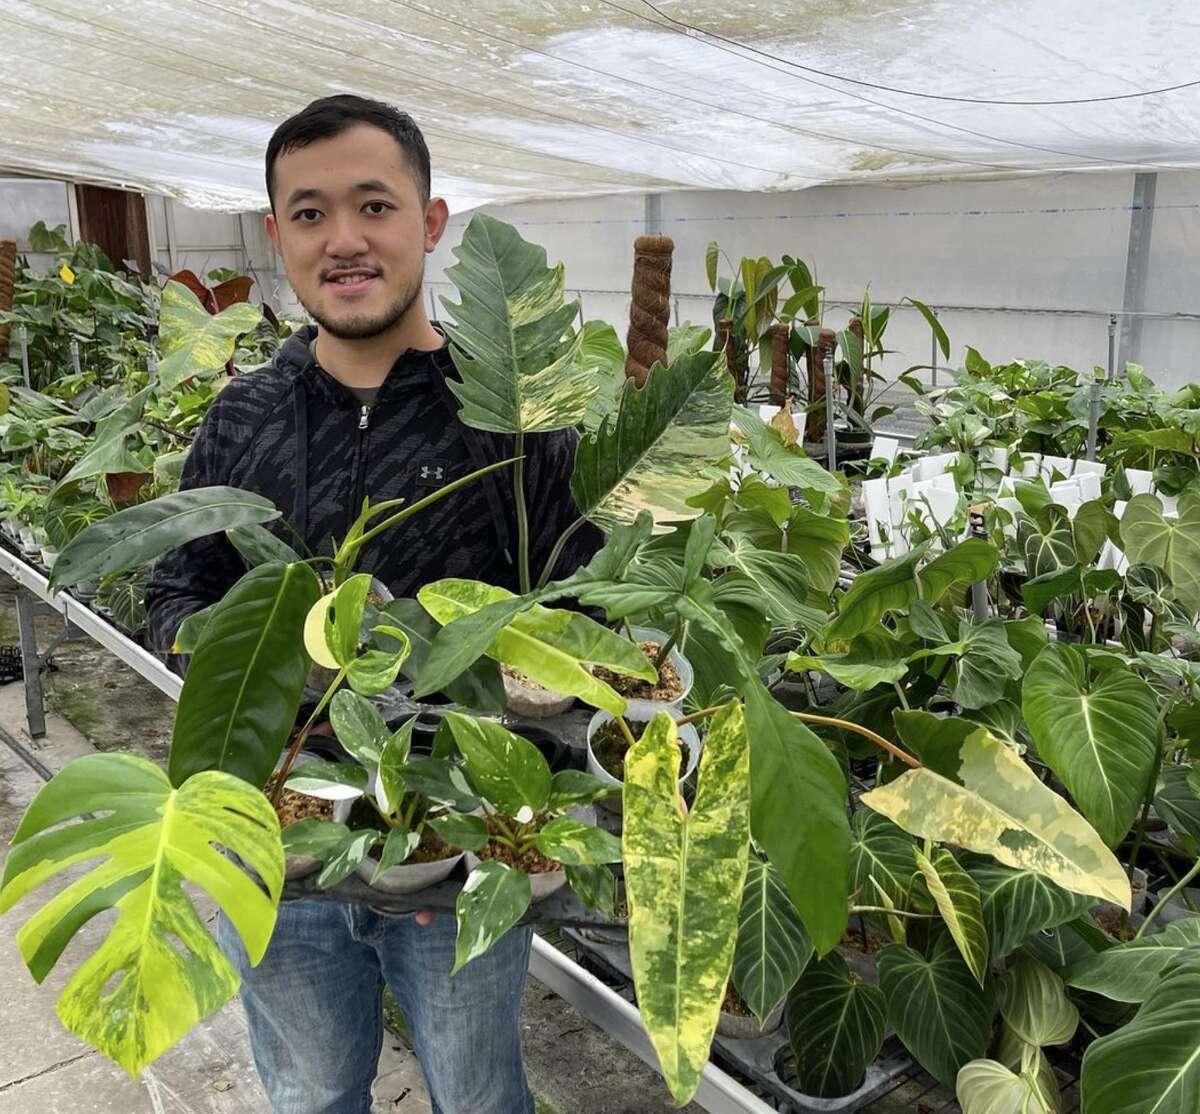 Bryan Wu poses in the Wuhoo greenhouse.